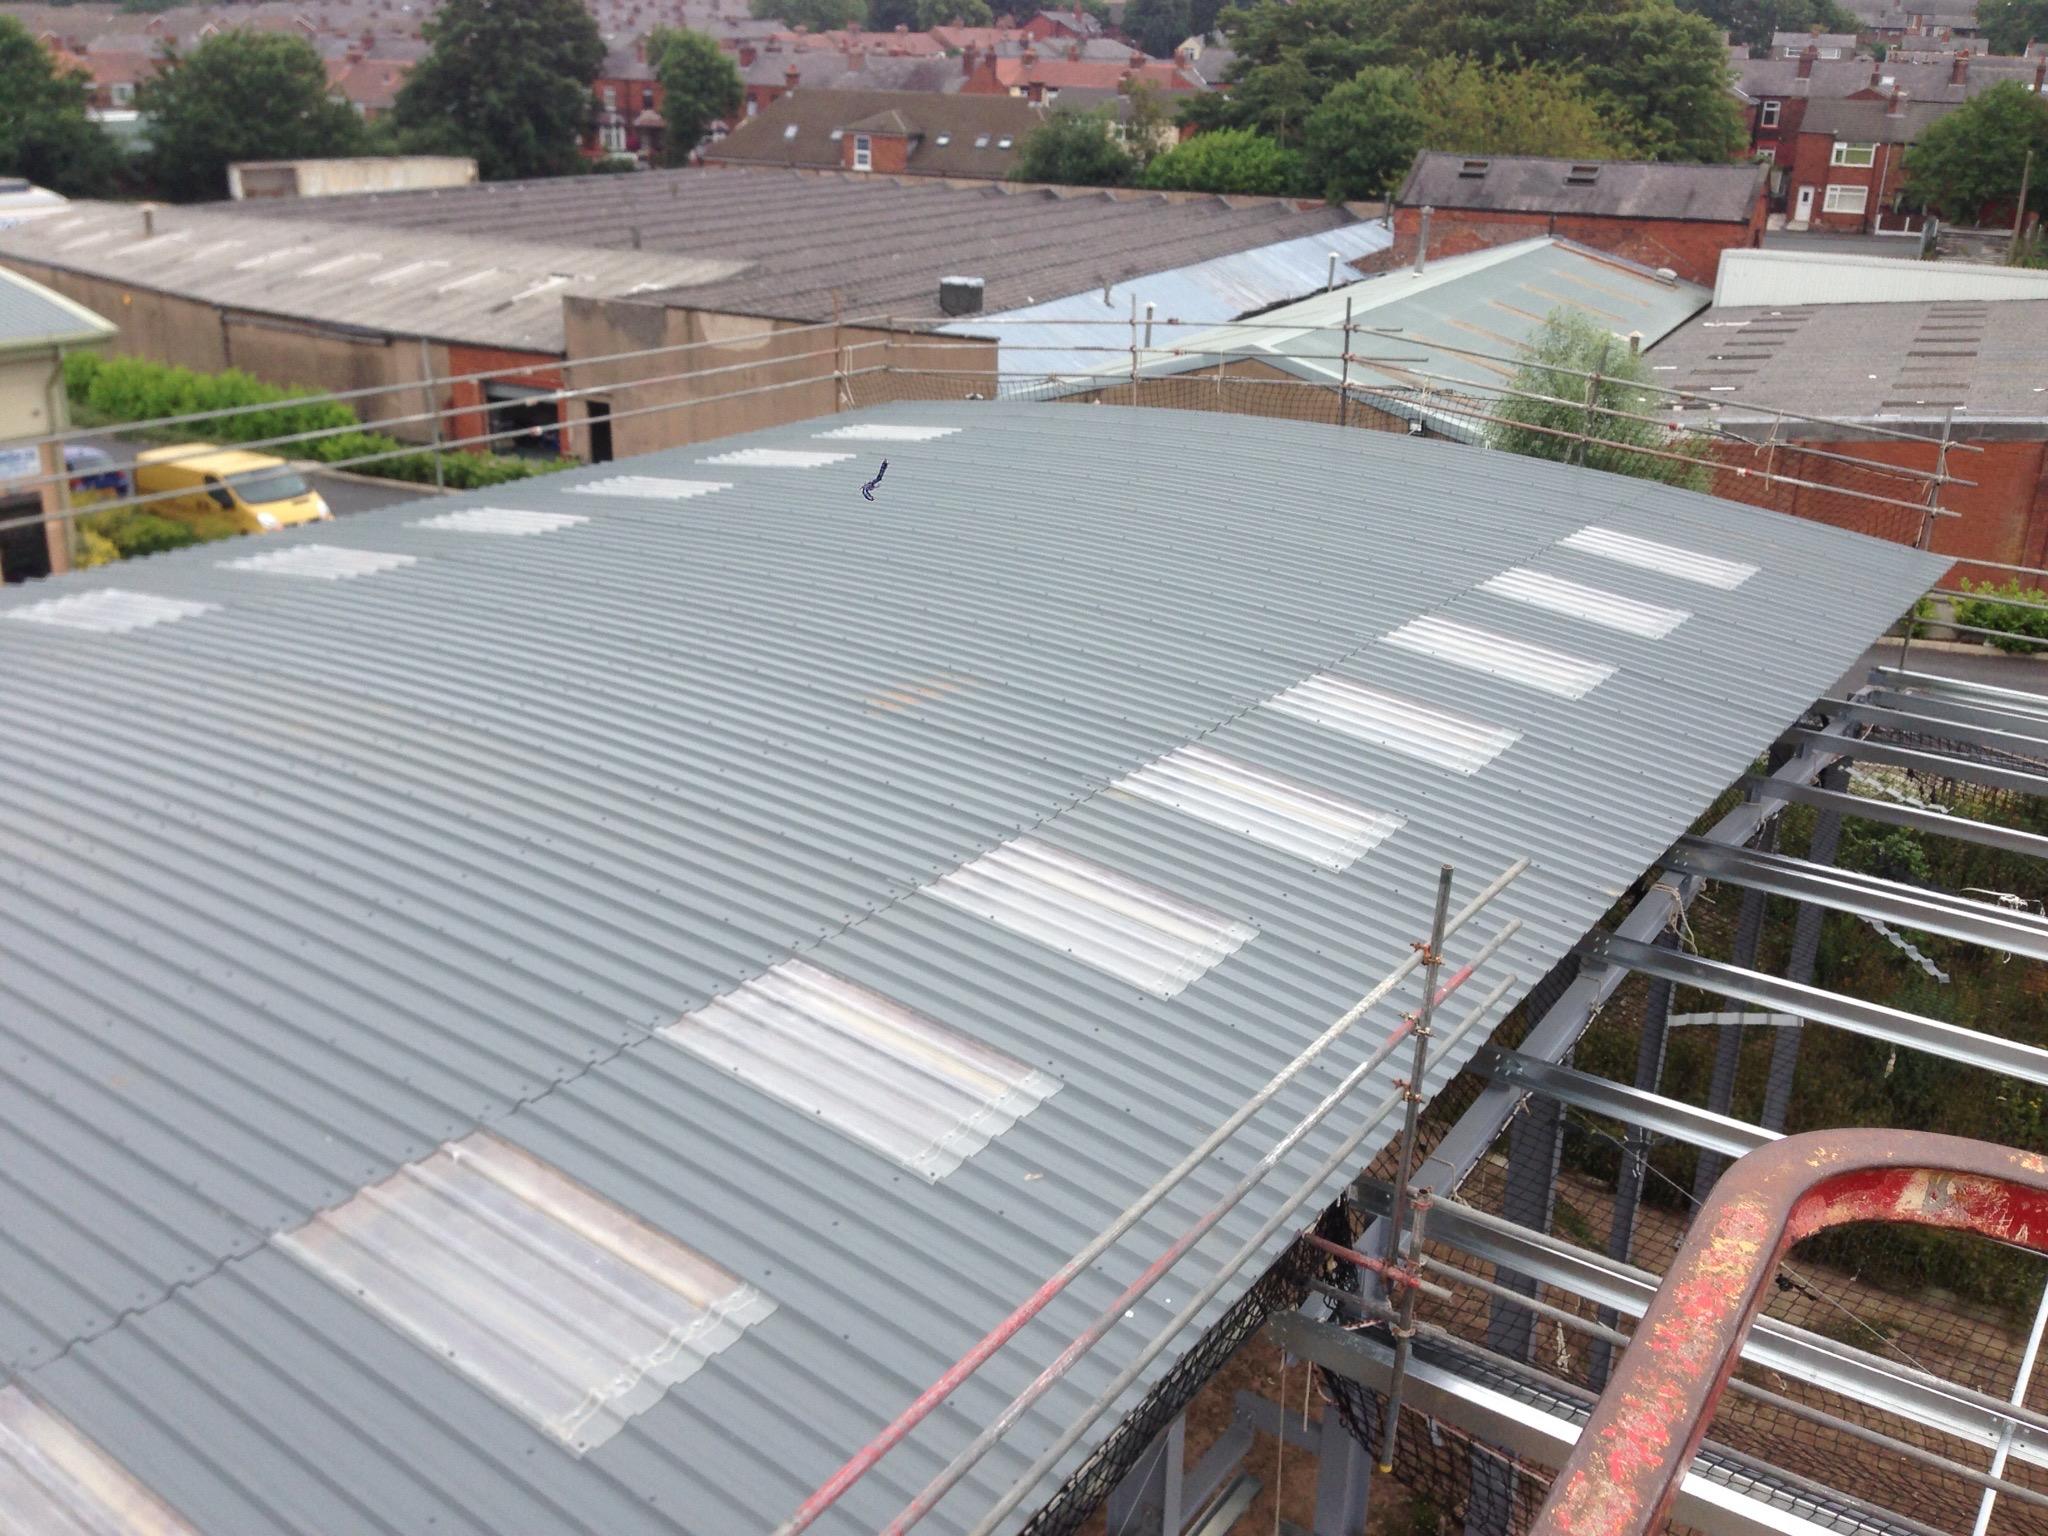 Grp Roof Lights Amp Sheets Contractors Alltite Metal Roofing